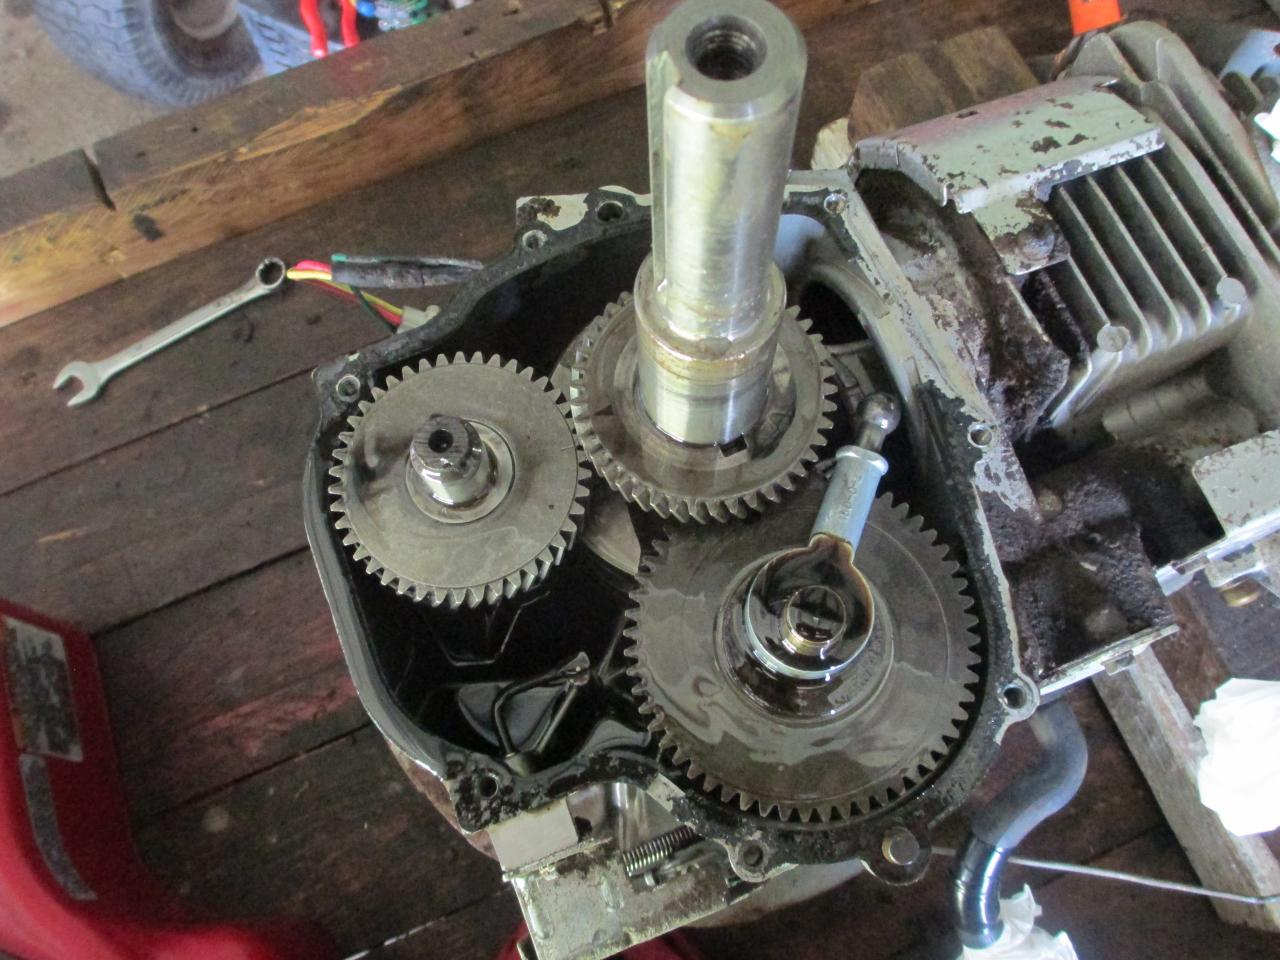 Tecumseh 13 5 hp - OutdoorKing Repair Forum